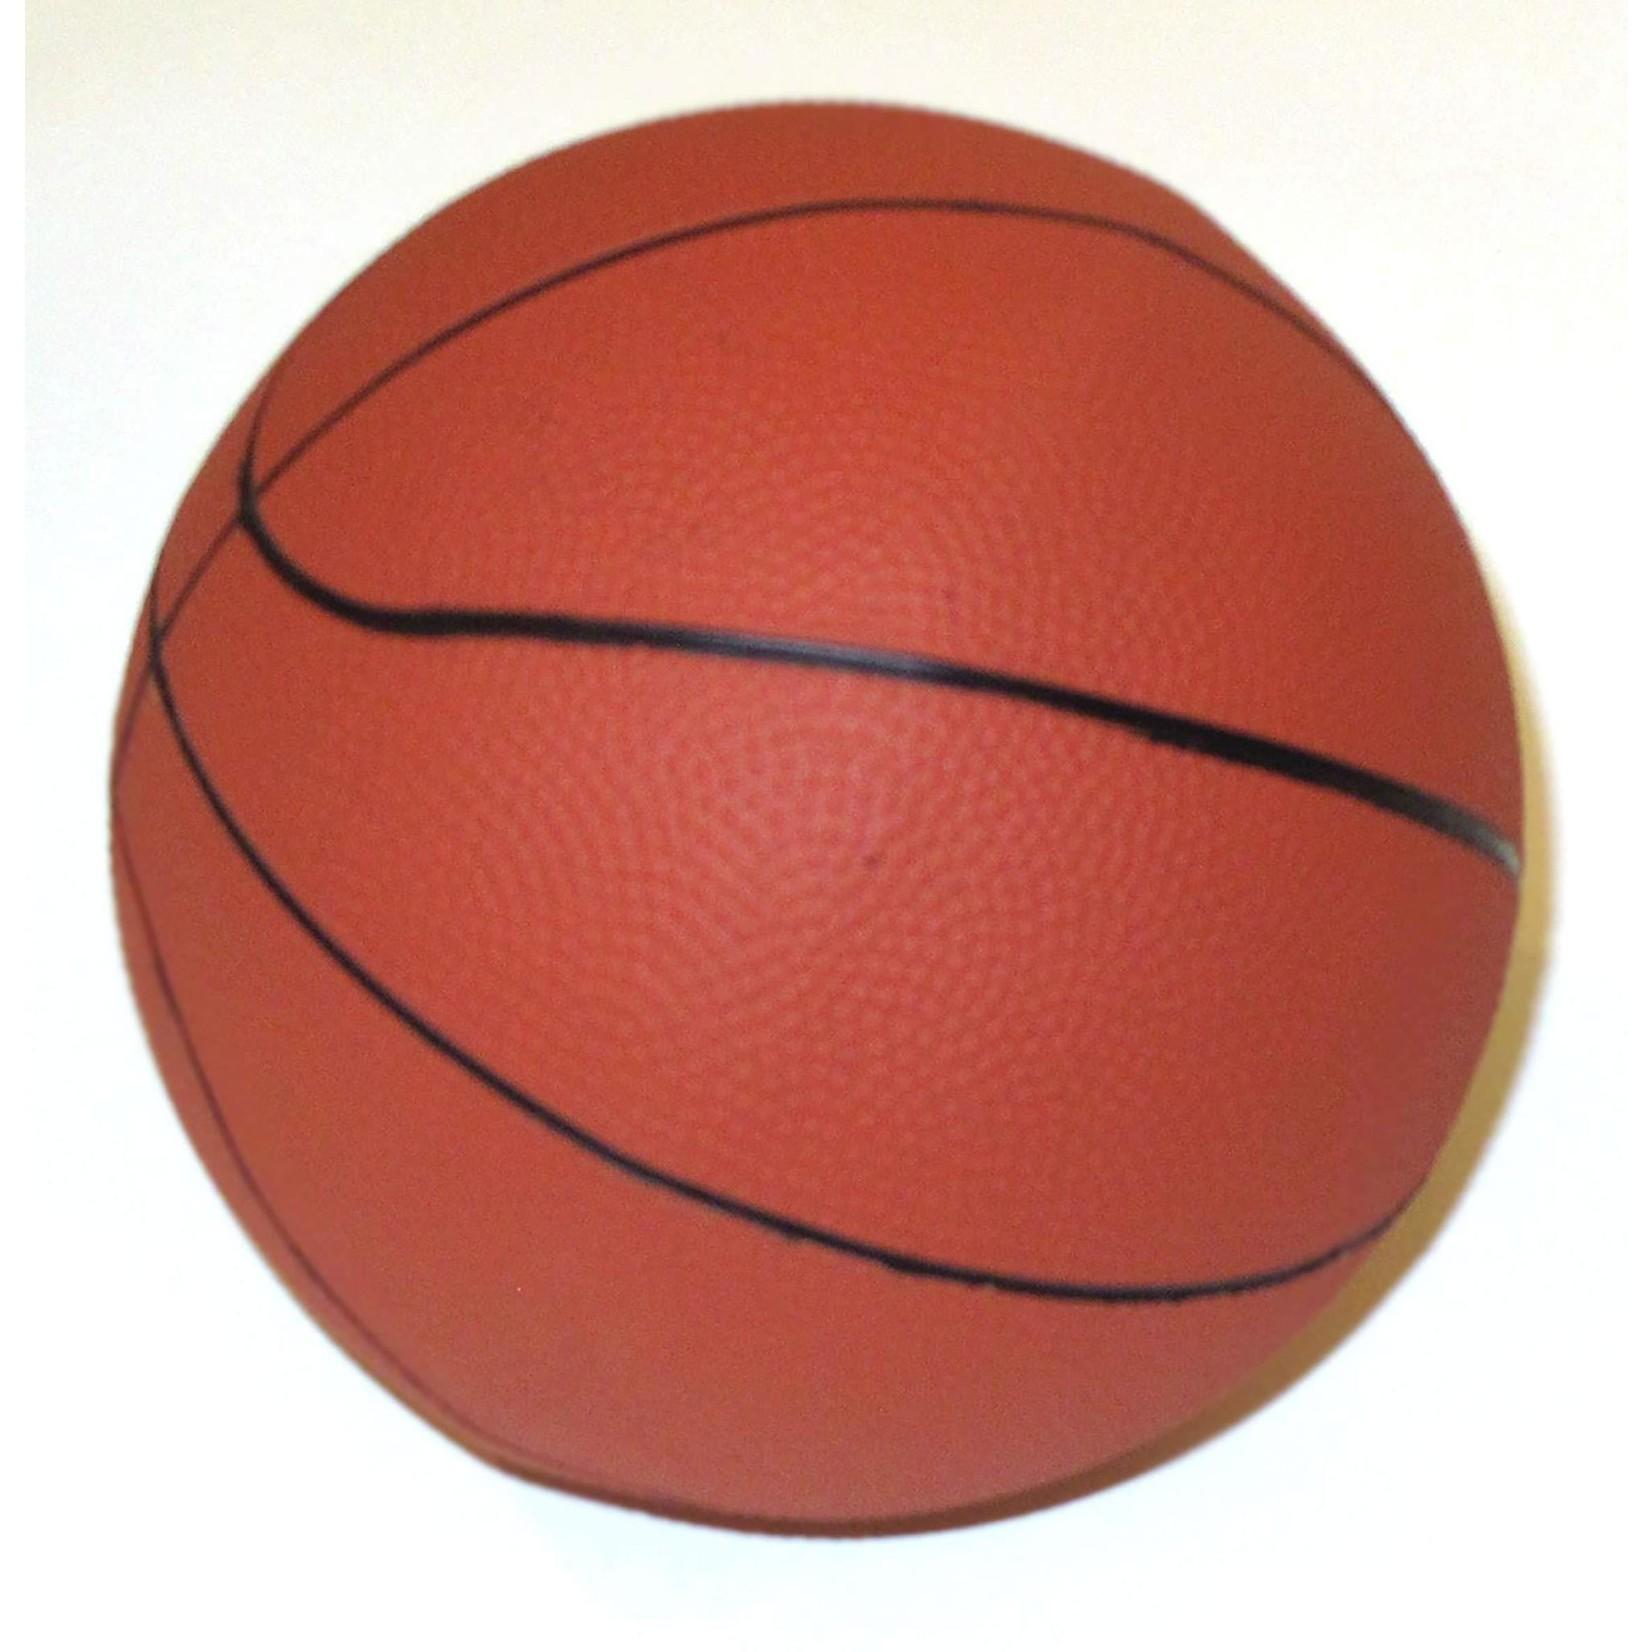 BASKETBALL POOL JAM COMBO